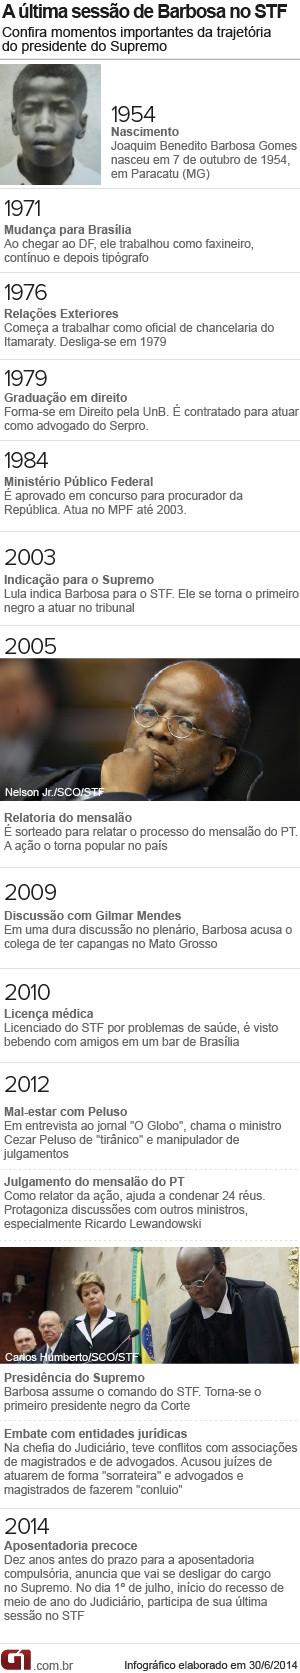 Cronologia Joaquim Barbosa (Foto: Editoria de Arte / G1)